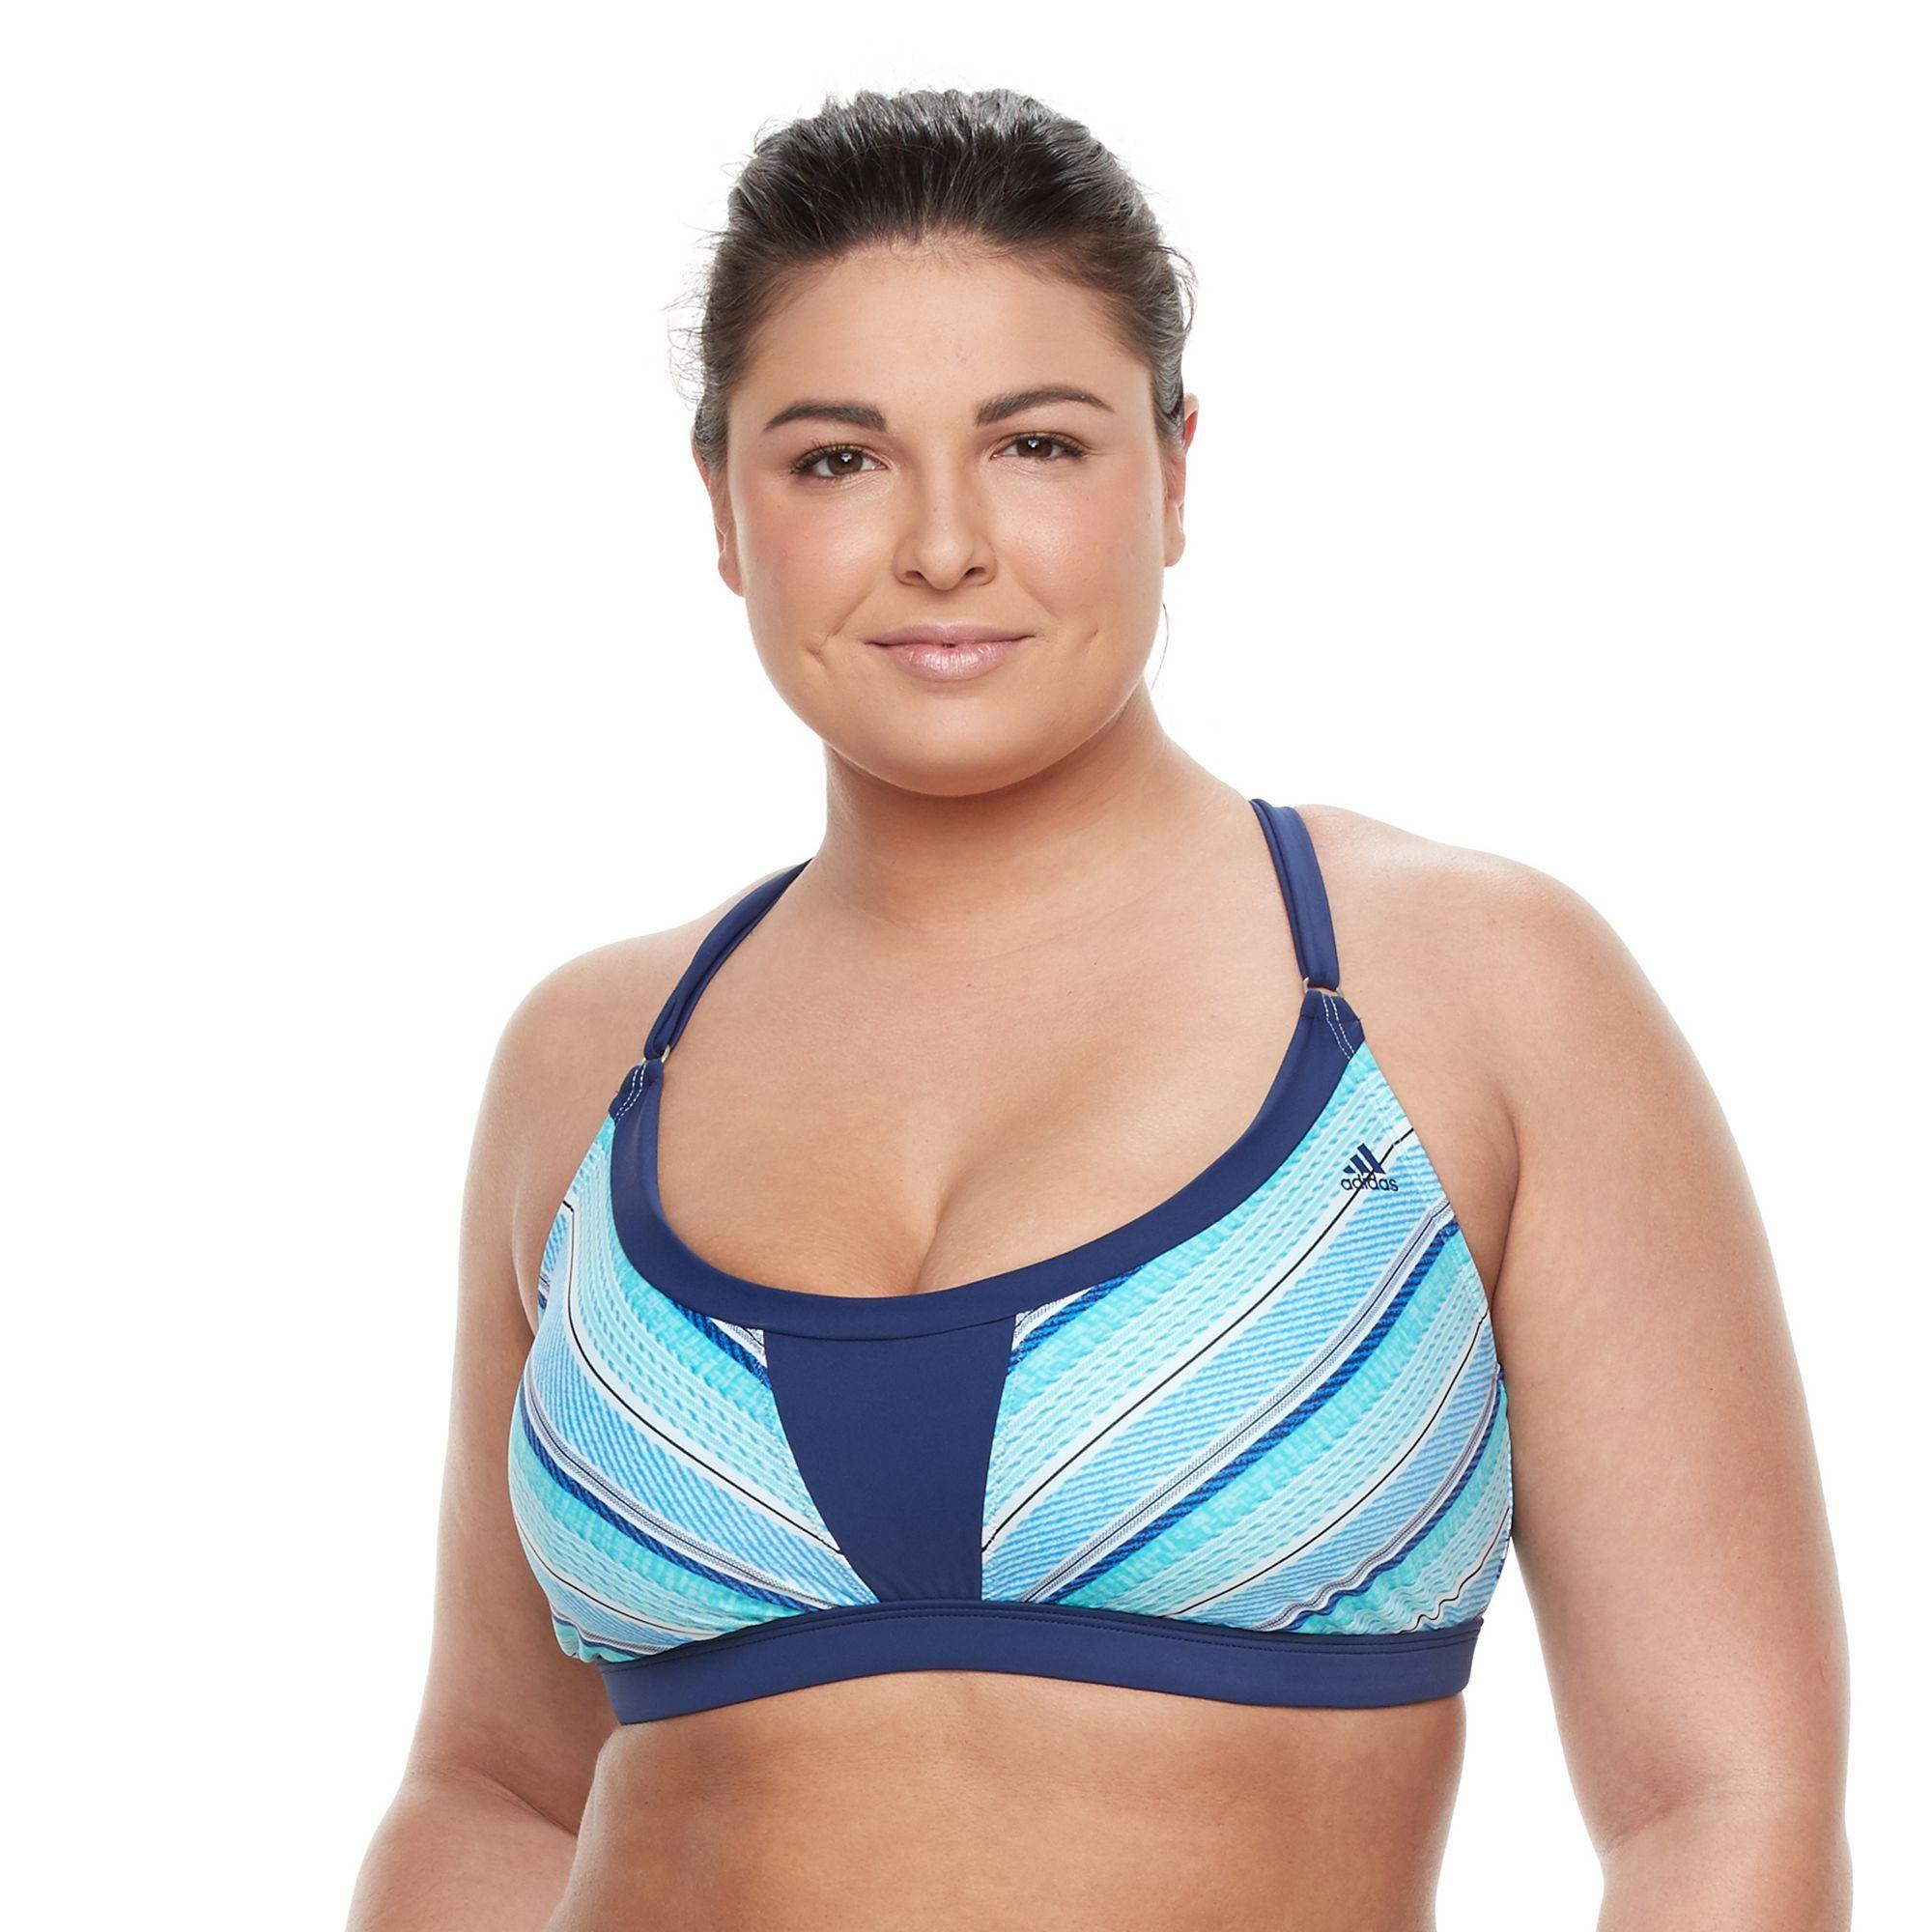 Plus Size Top, Adidas Strike a Pose Pose Sporty Bikini Bikini Top, Mujer, Tamaño: 3XL cfc0235 - grind.website